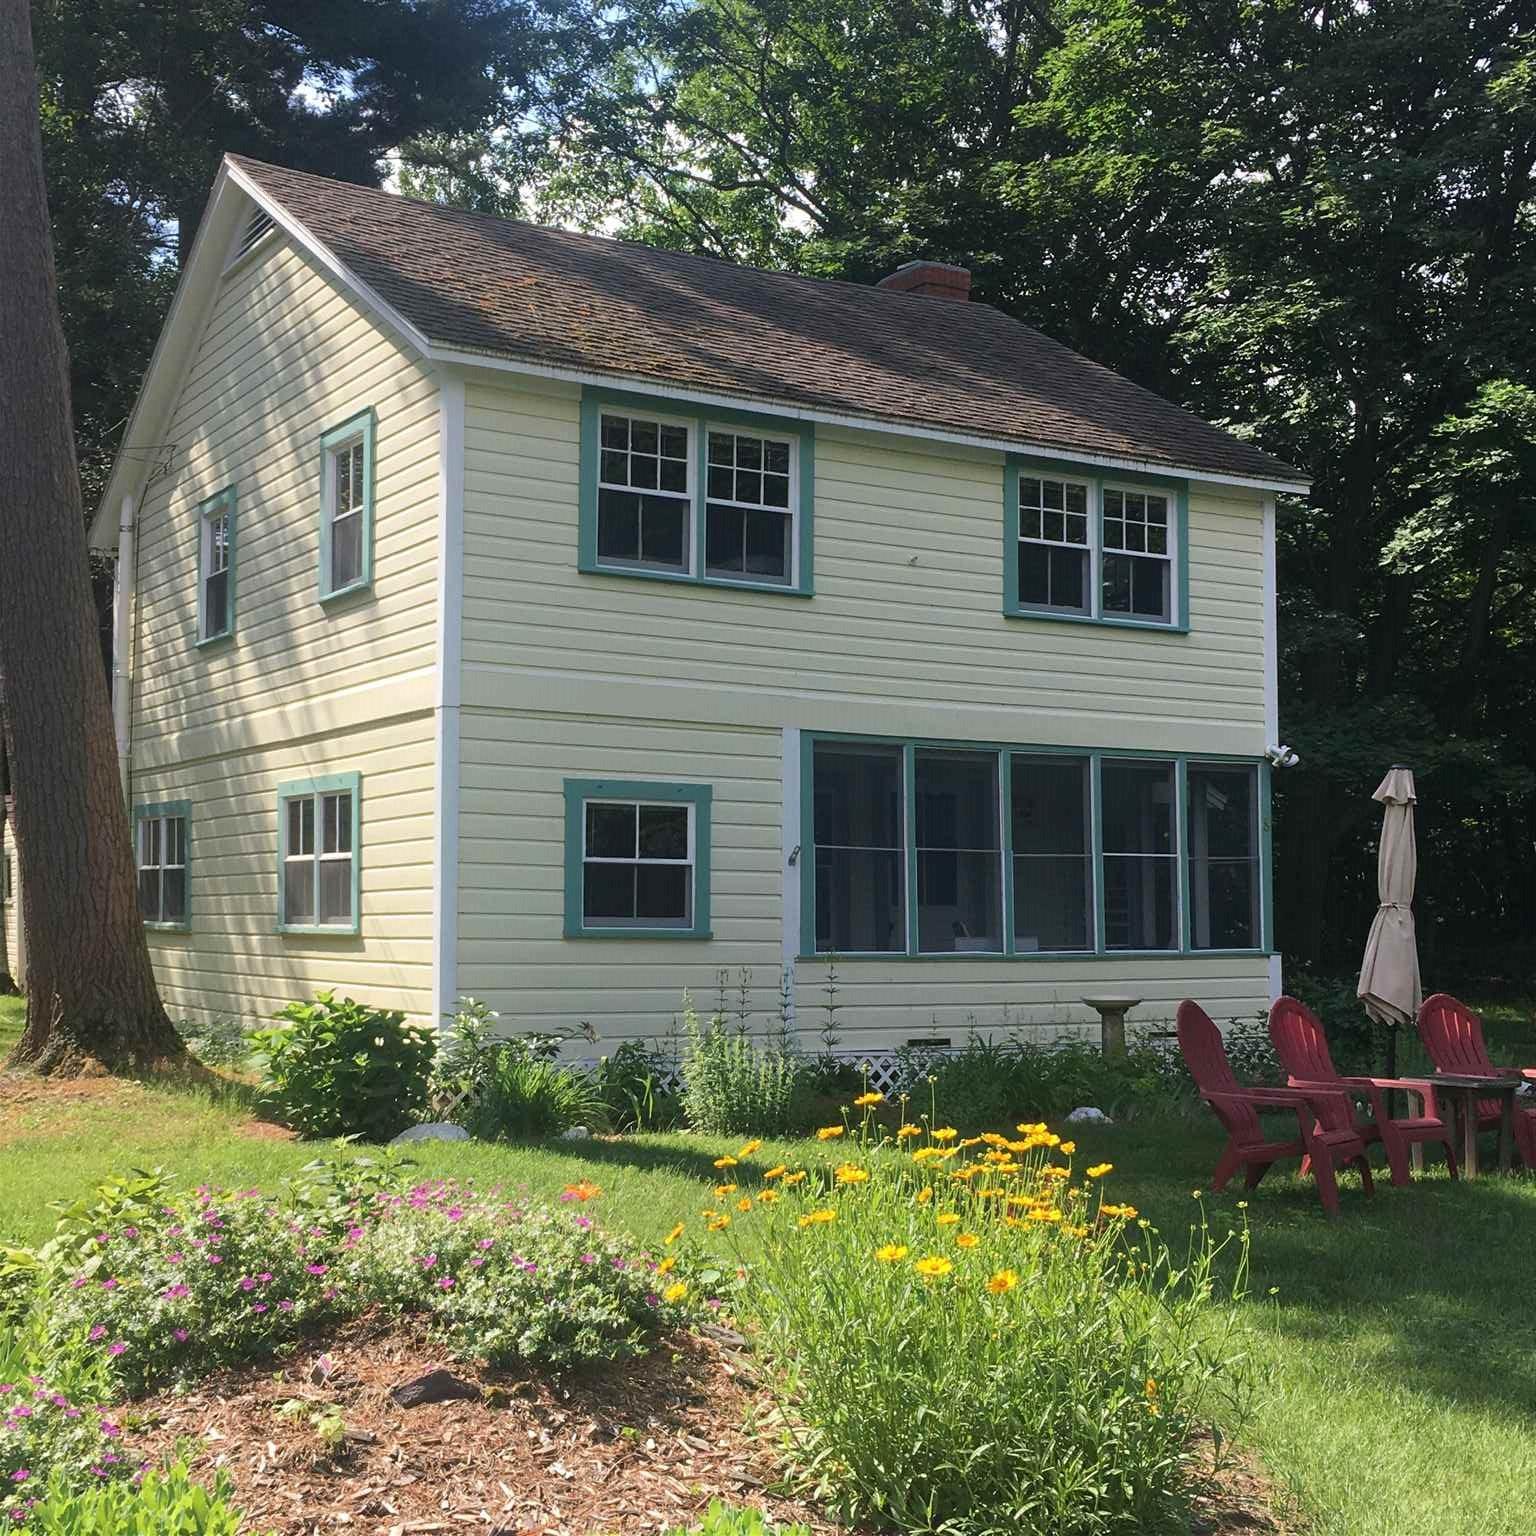 8 Starr Farm Beach Road, Burlington, Vermont 05408, 4 Bedrooms Bedrooms, ,2 BathroomsBathrooms,Single Family,For Sale,8 Starr Farm Beach Road,2,4813752